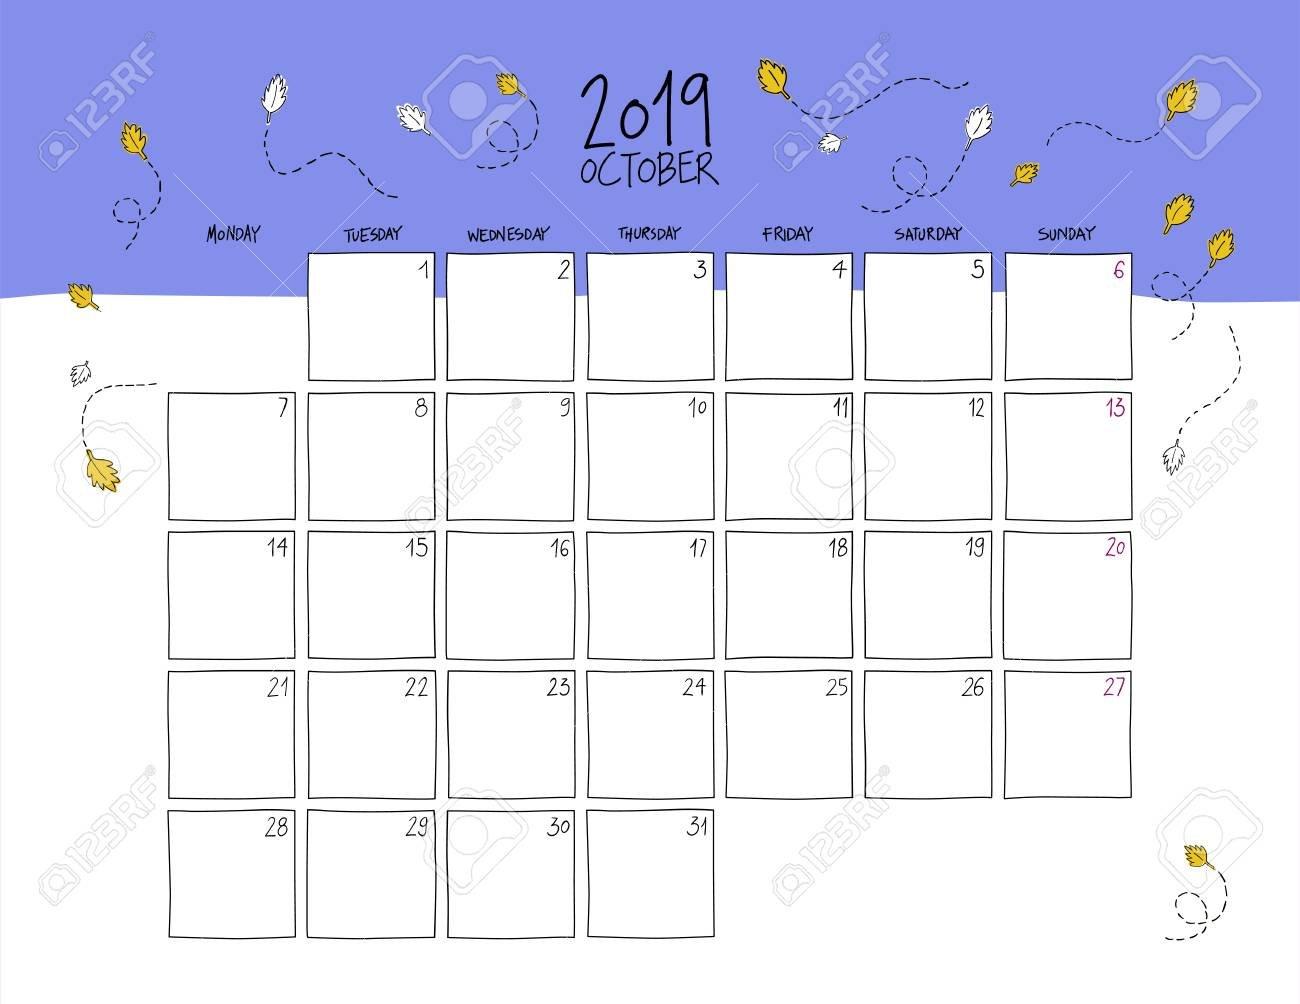 October 2019 Wall Calendar. Colorful Sketch Horizontal Template Calendar 2019 For Wall